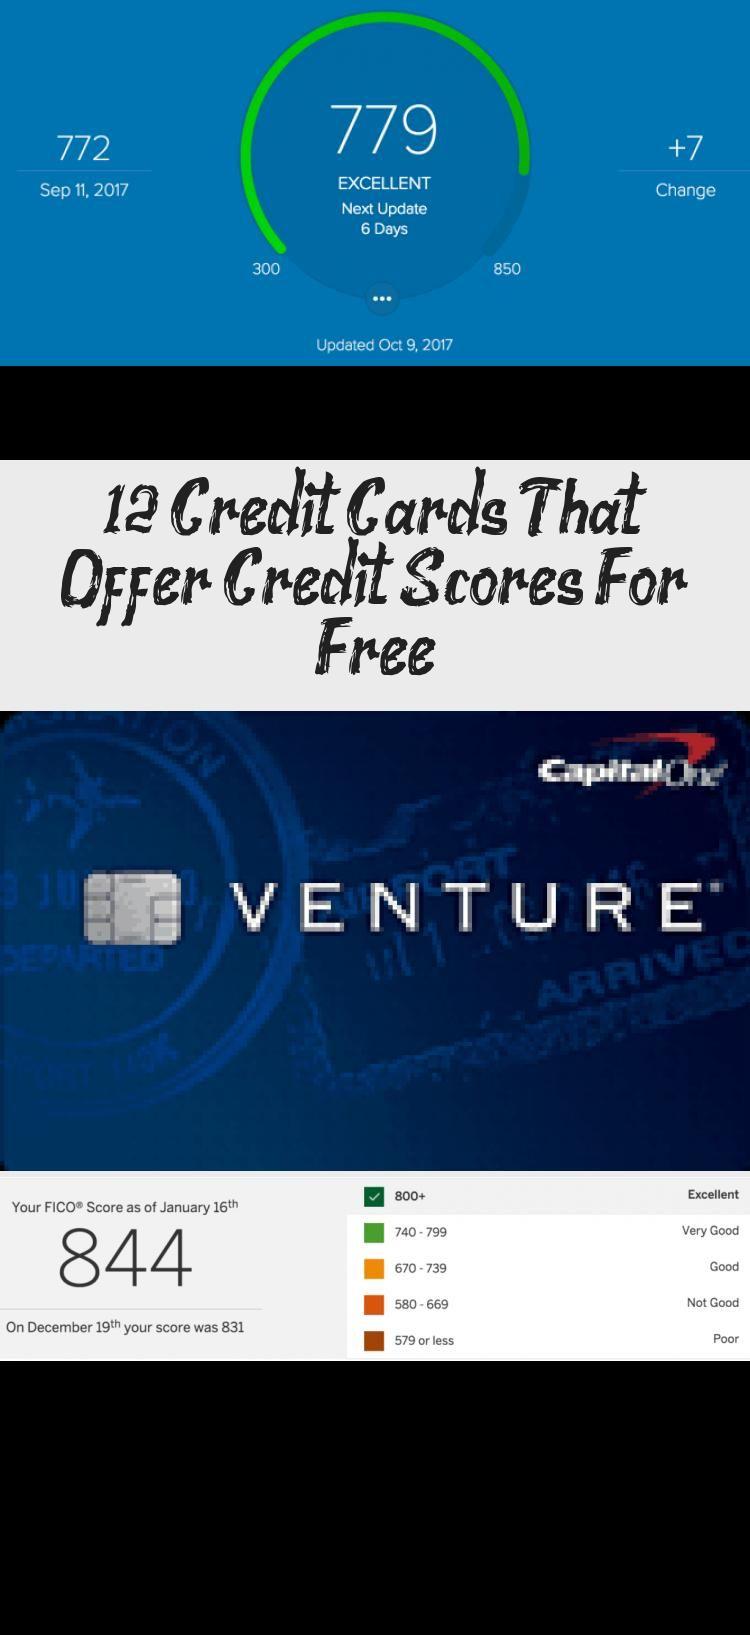 capital bank credit card reviews